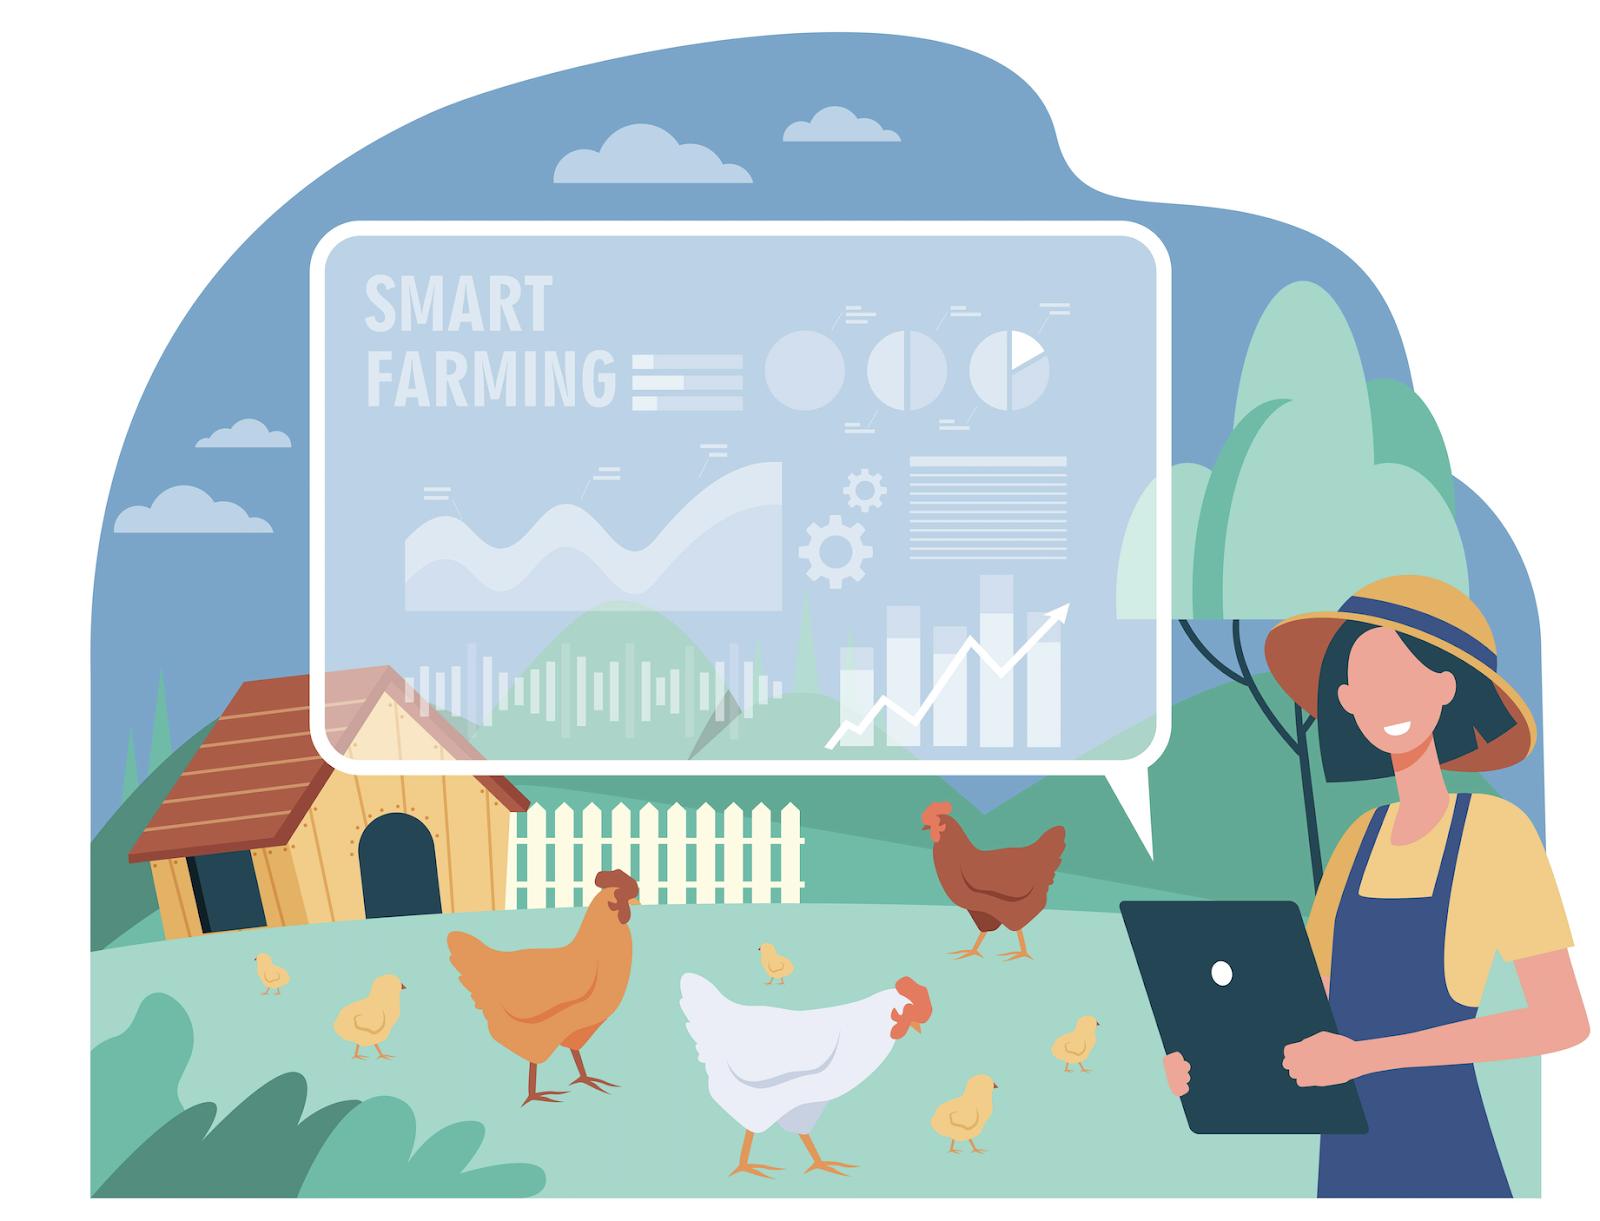 smart farming operations